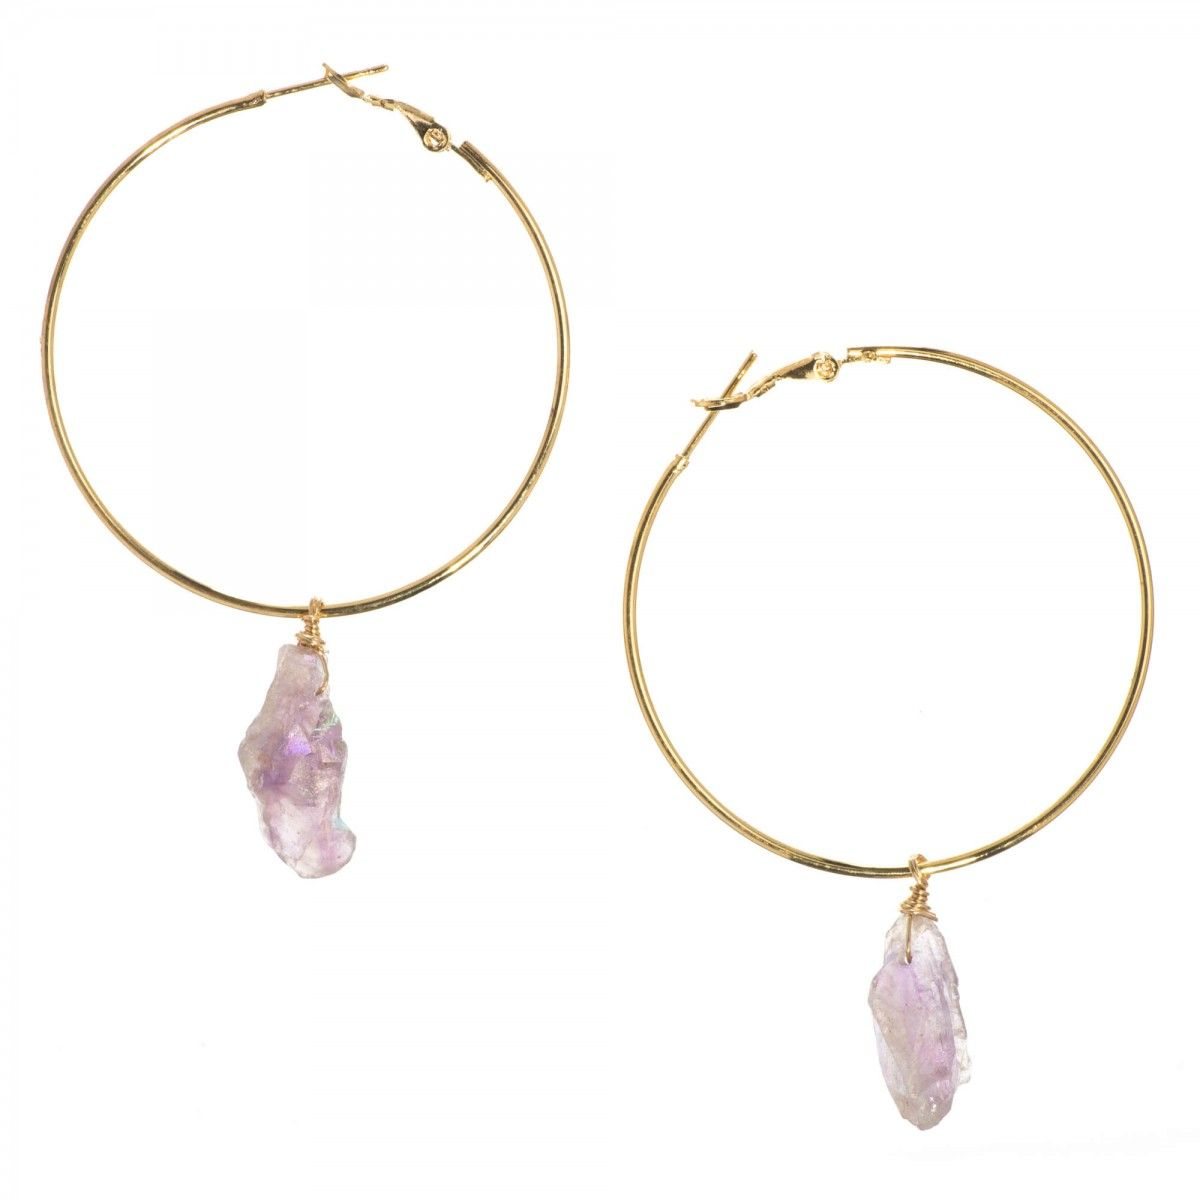 Luxe Wire Wrapped Ametrine Nugget Drop Hoop Earrings - Luxe Group ...